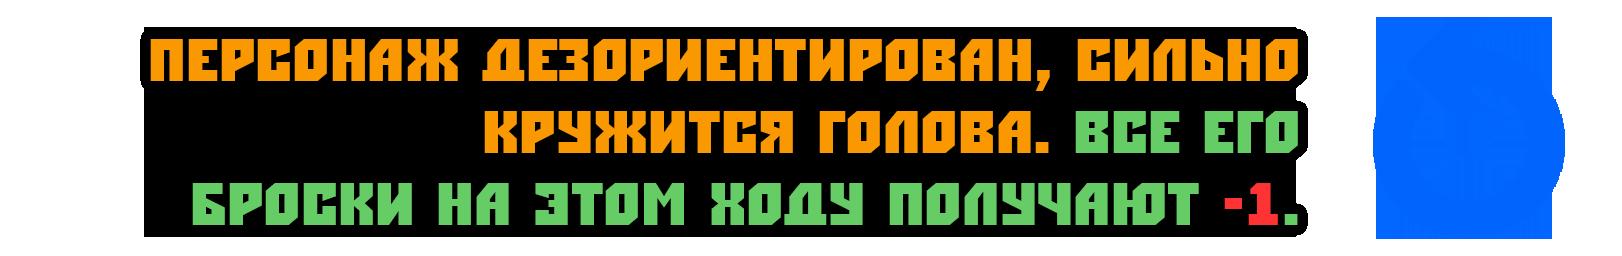 Тест боевой системы - Страница 8 O4ki_Urona_Golovokruzhenije_Forum_Vova_2